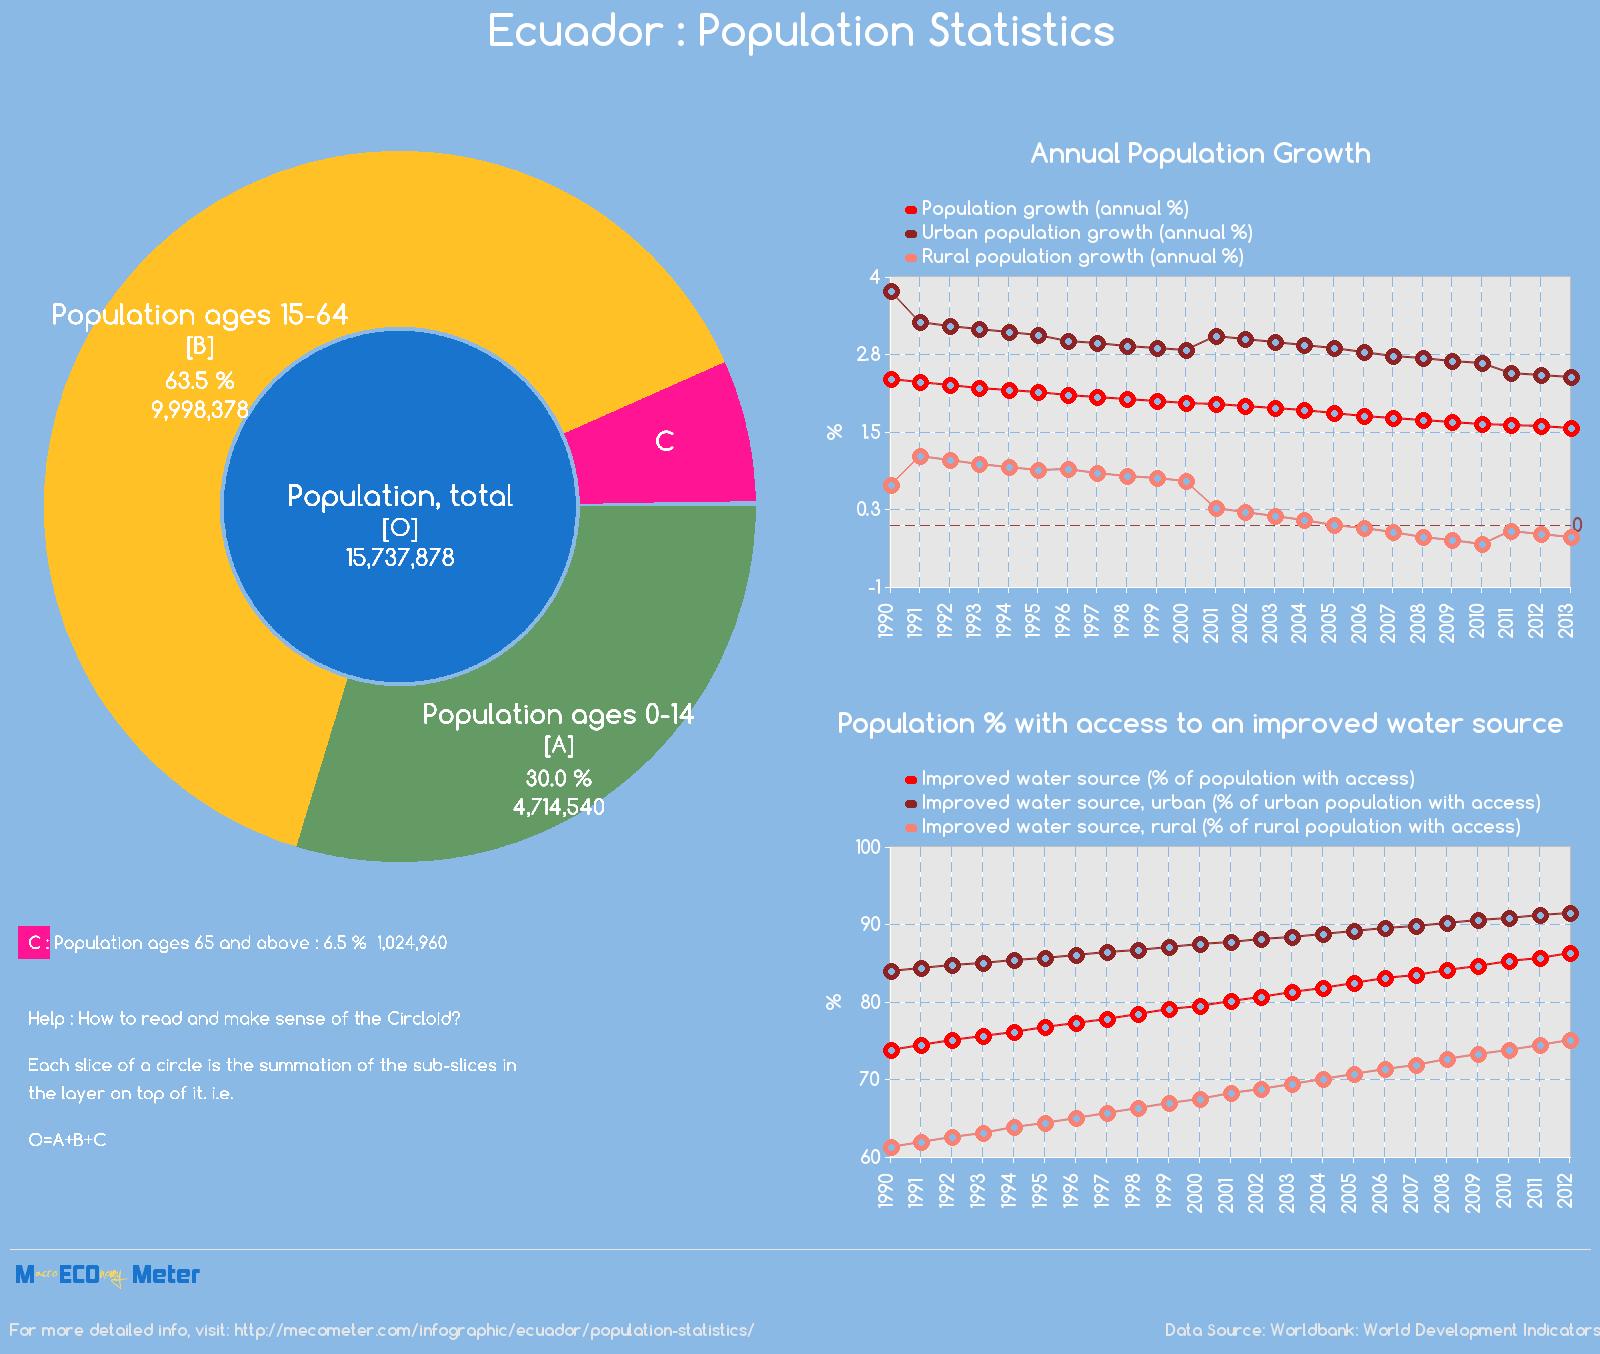 Ecuador : Population Statistics